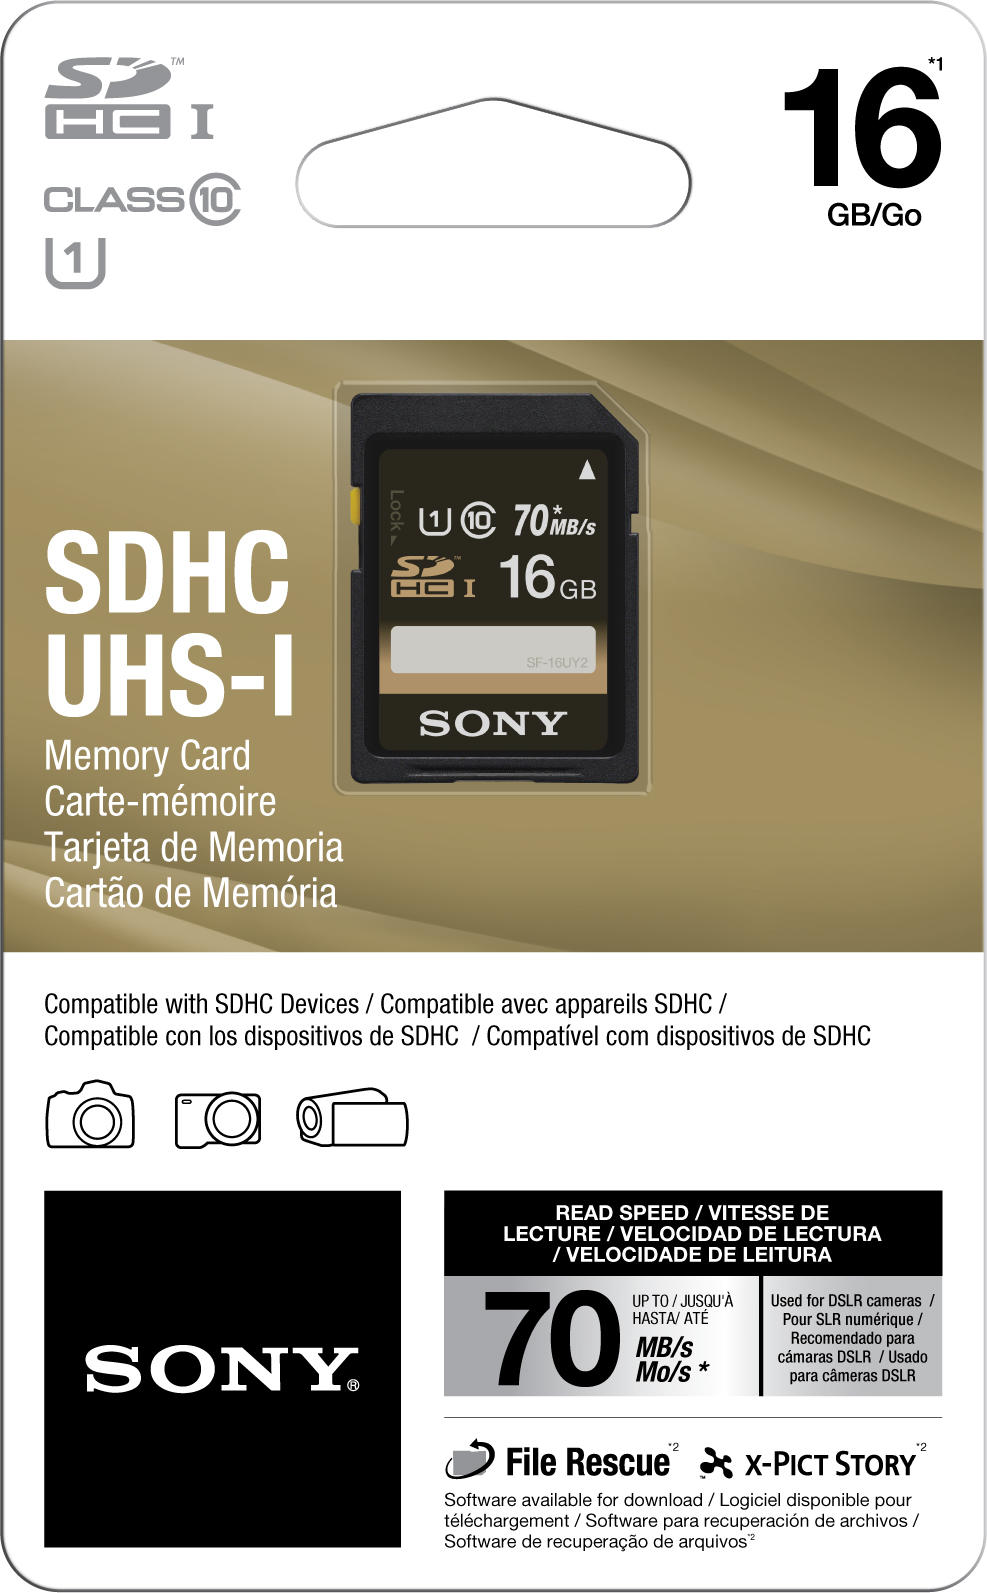 Cartão SDHC 16Gb Sony 70mb/s Classe 10 UHS-1